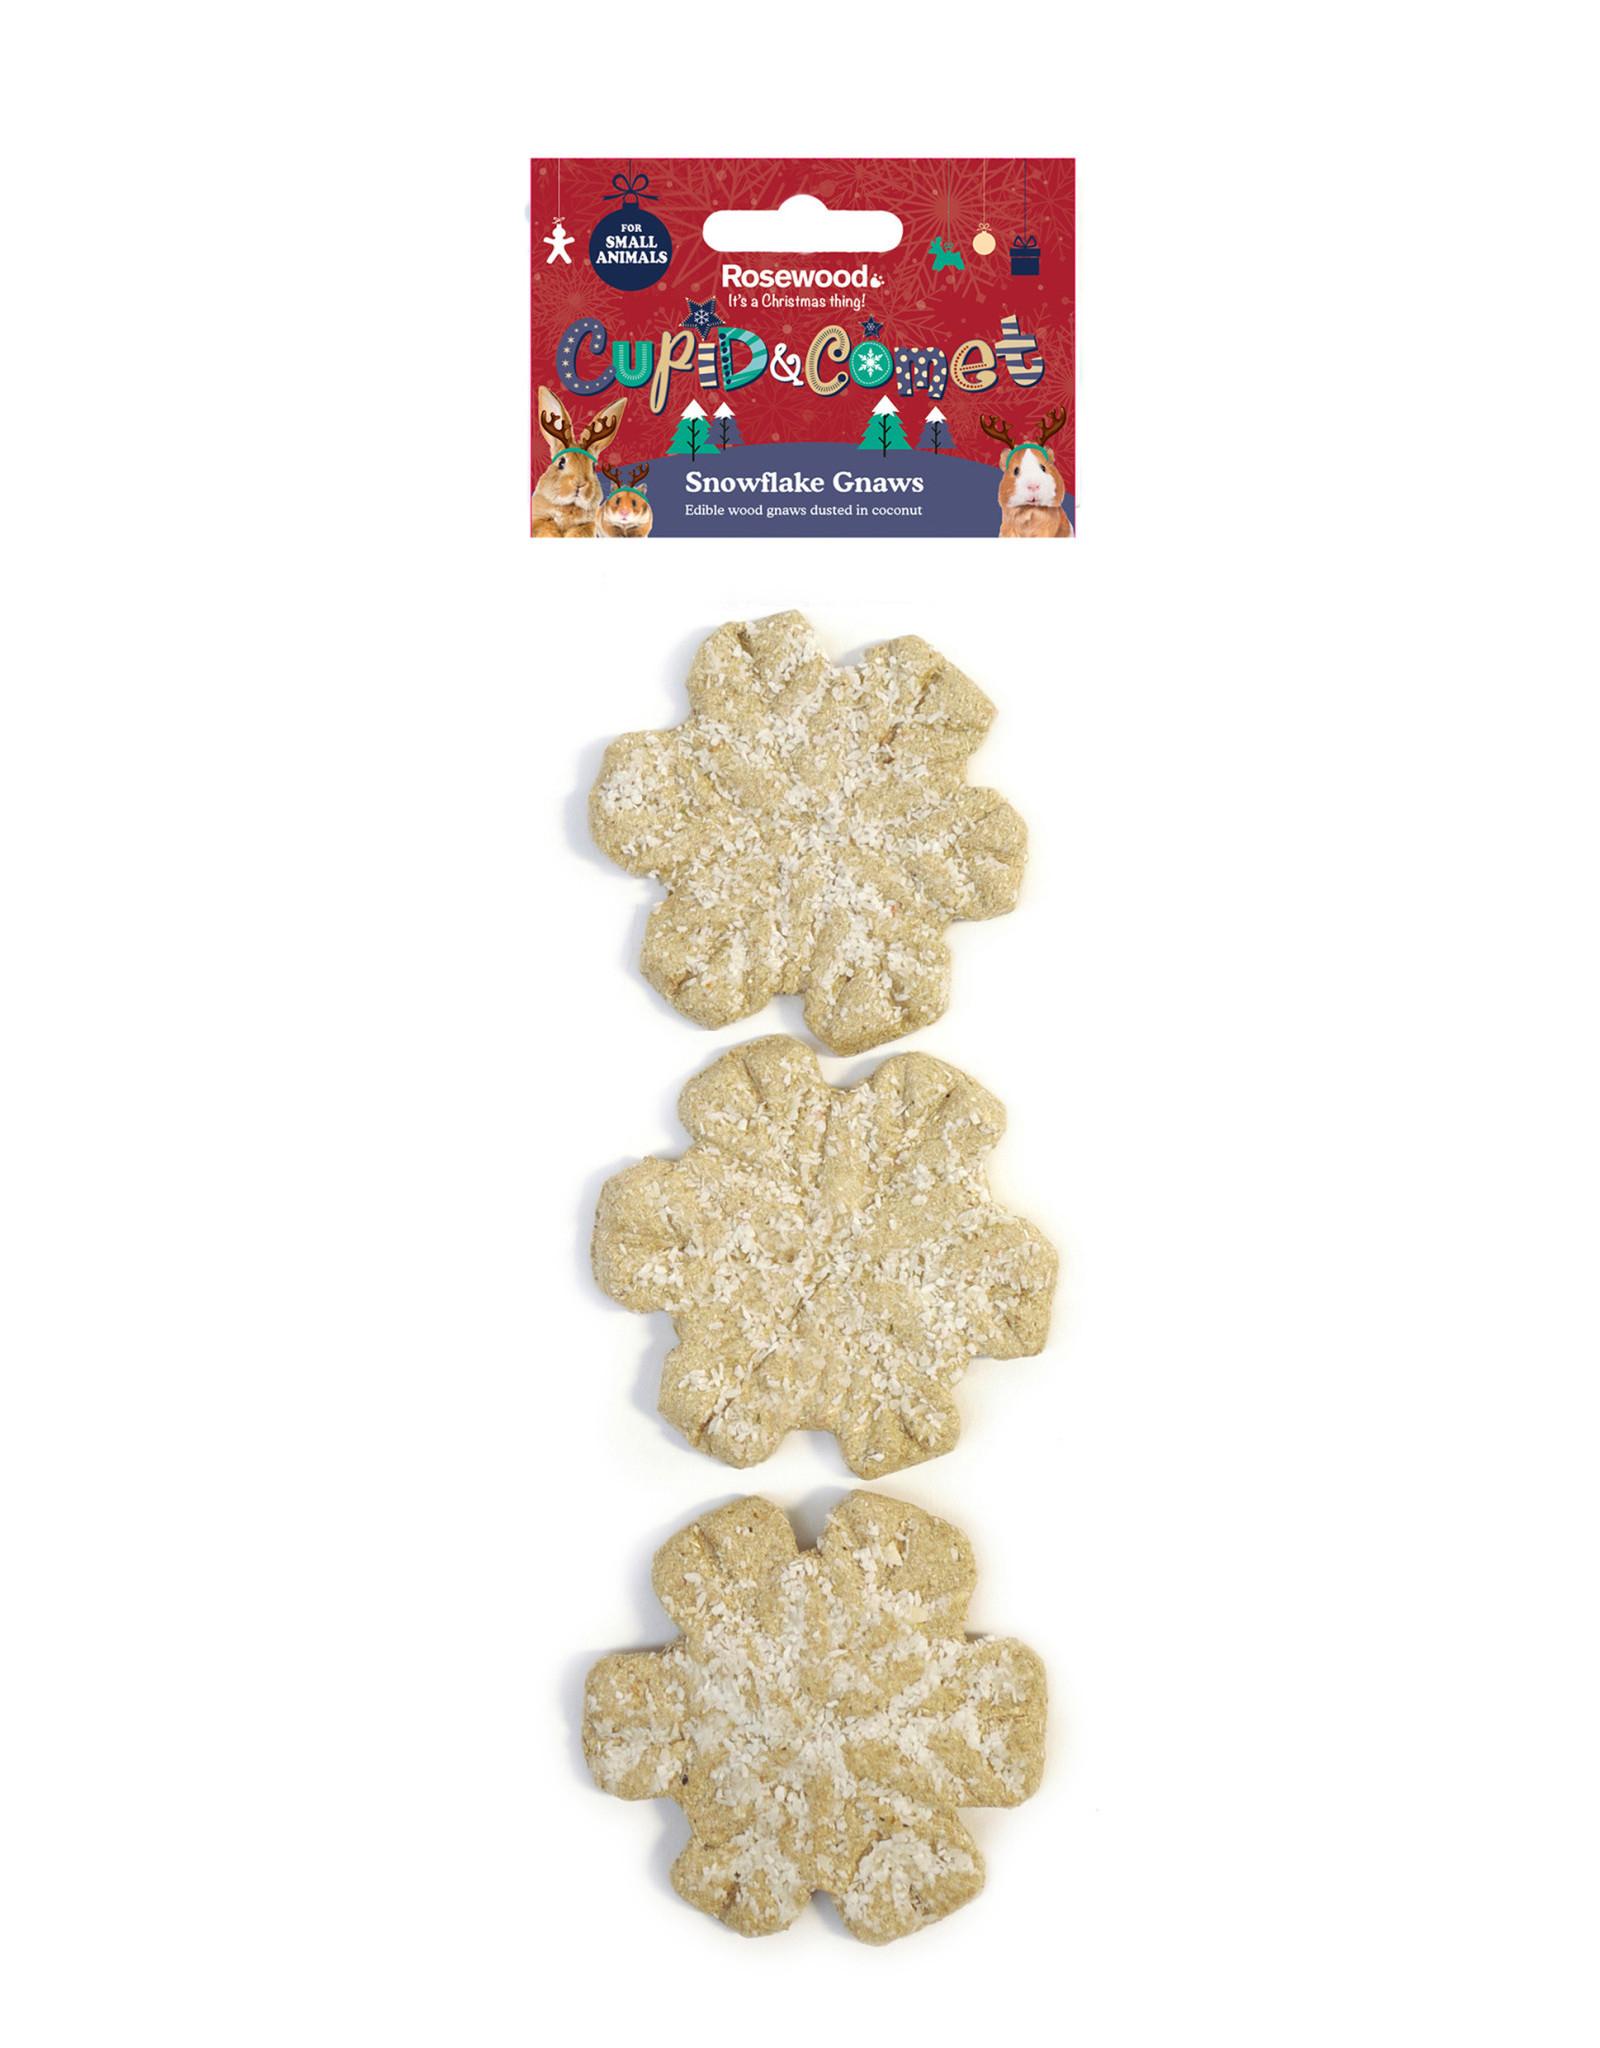 Rosewood Christmas Cupid & Comet Small Animal Edible Snowflake Gnaws 3 pack